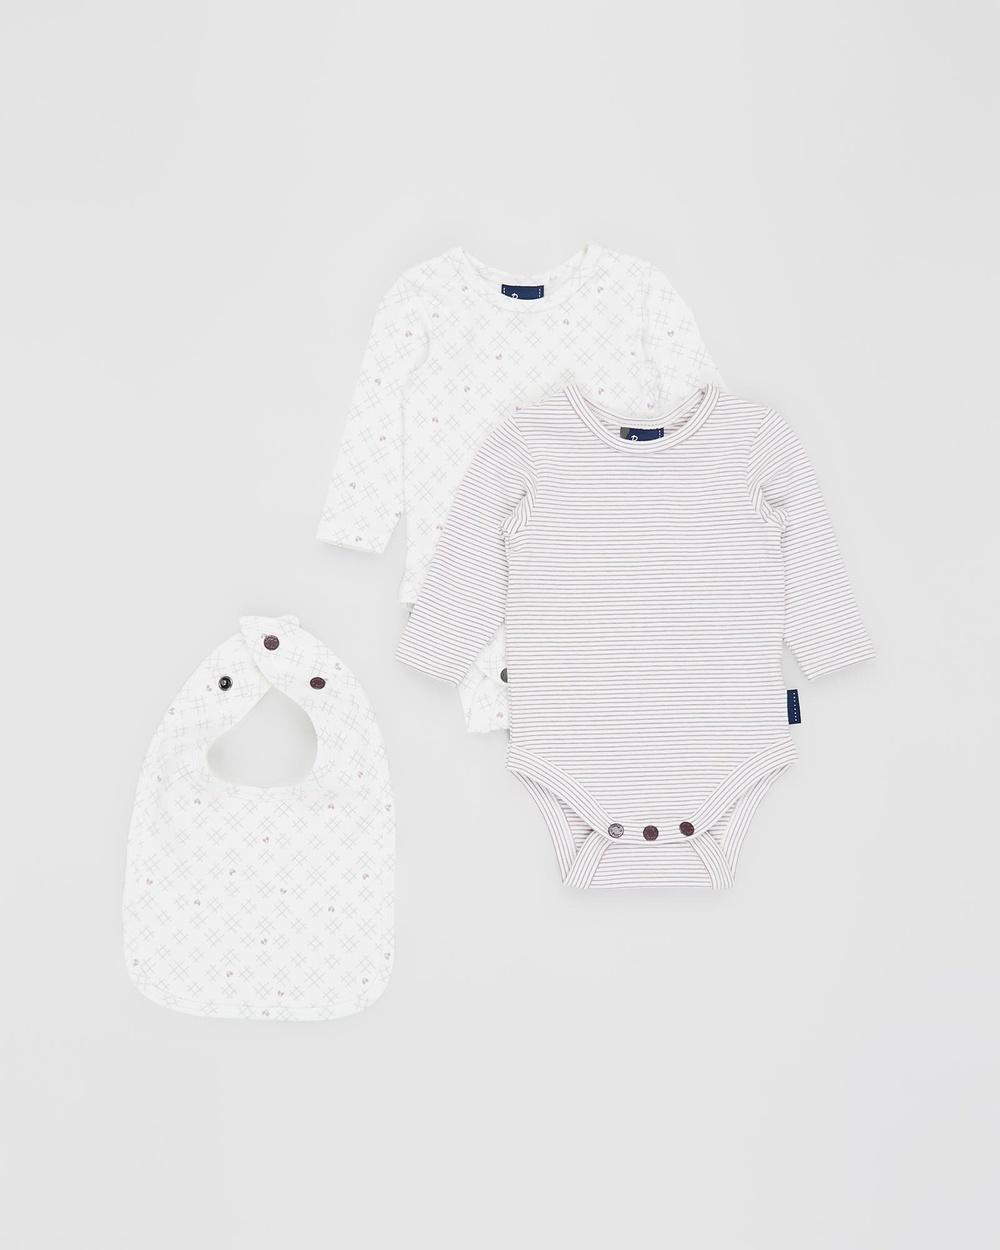 Pappe 3 Piece Nimmy Long Sleeve Bodysuit Set Bibs Elderberry & Sassafras Heart Crosses 3-Piece